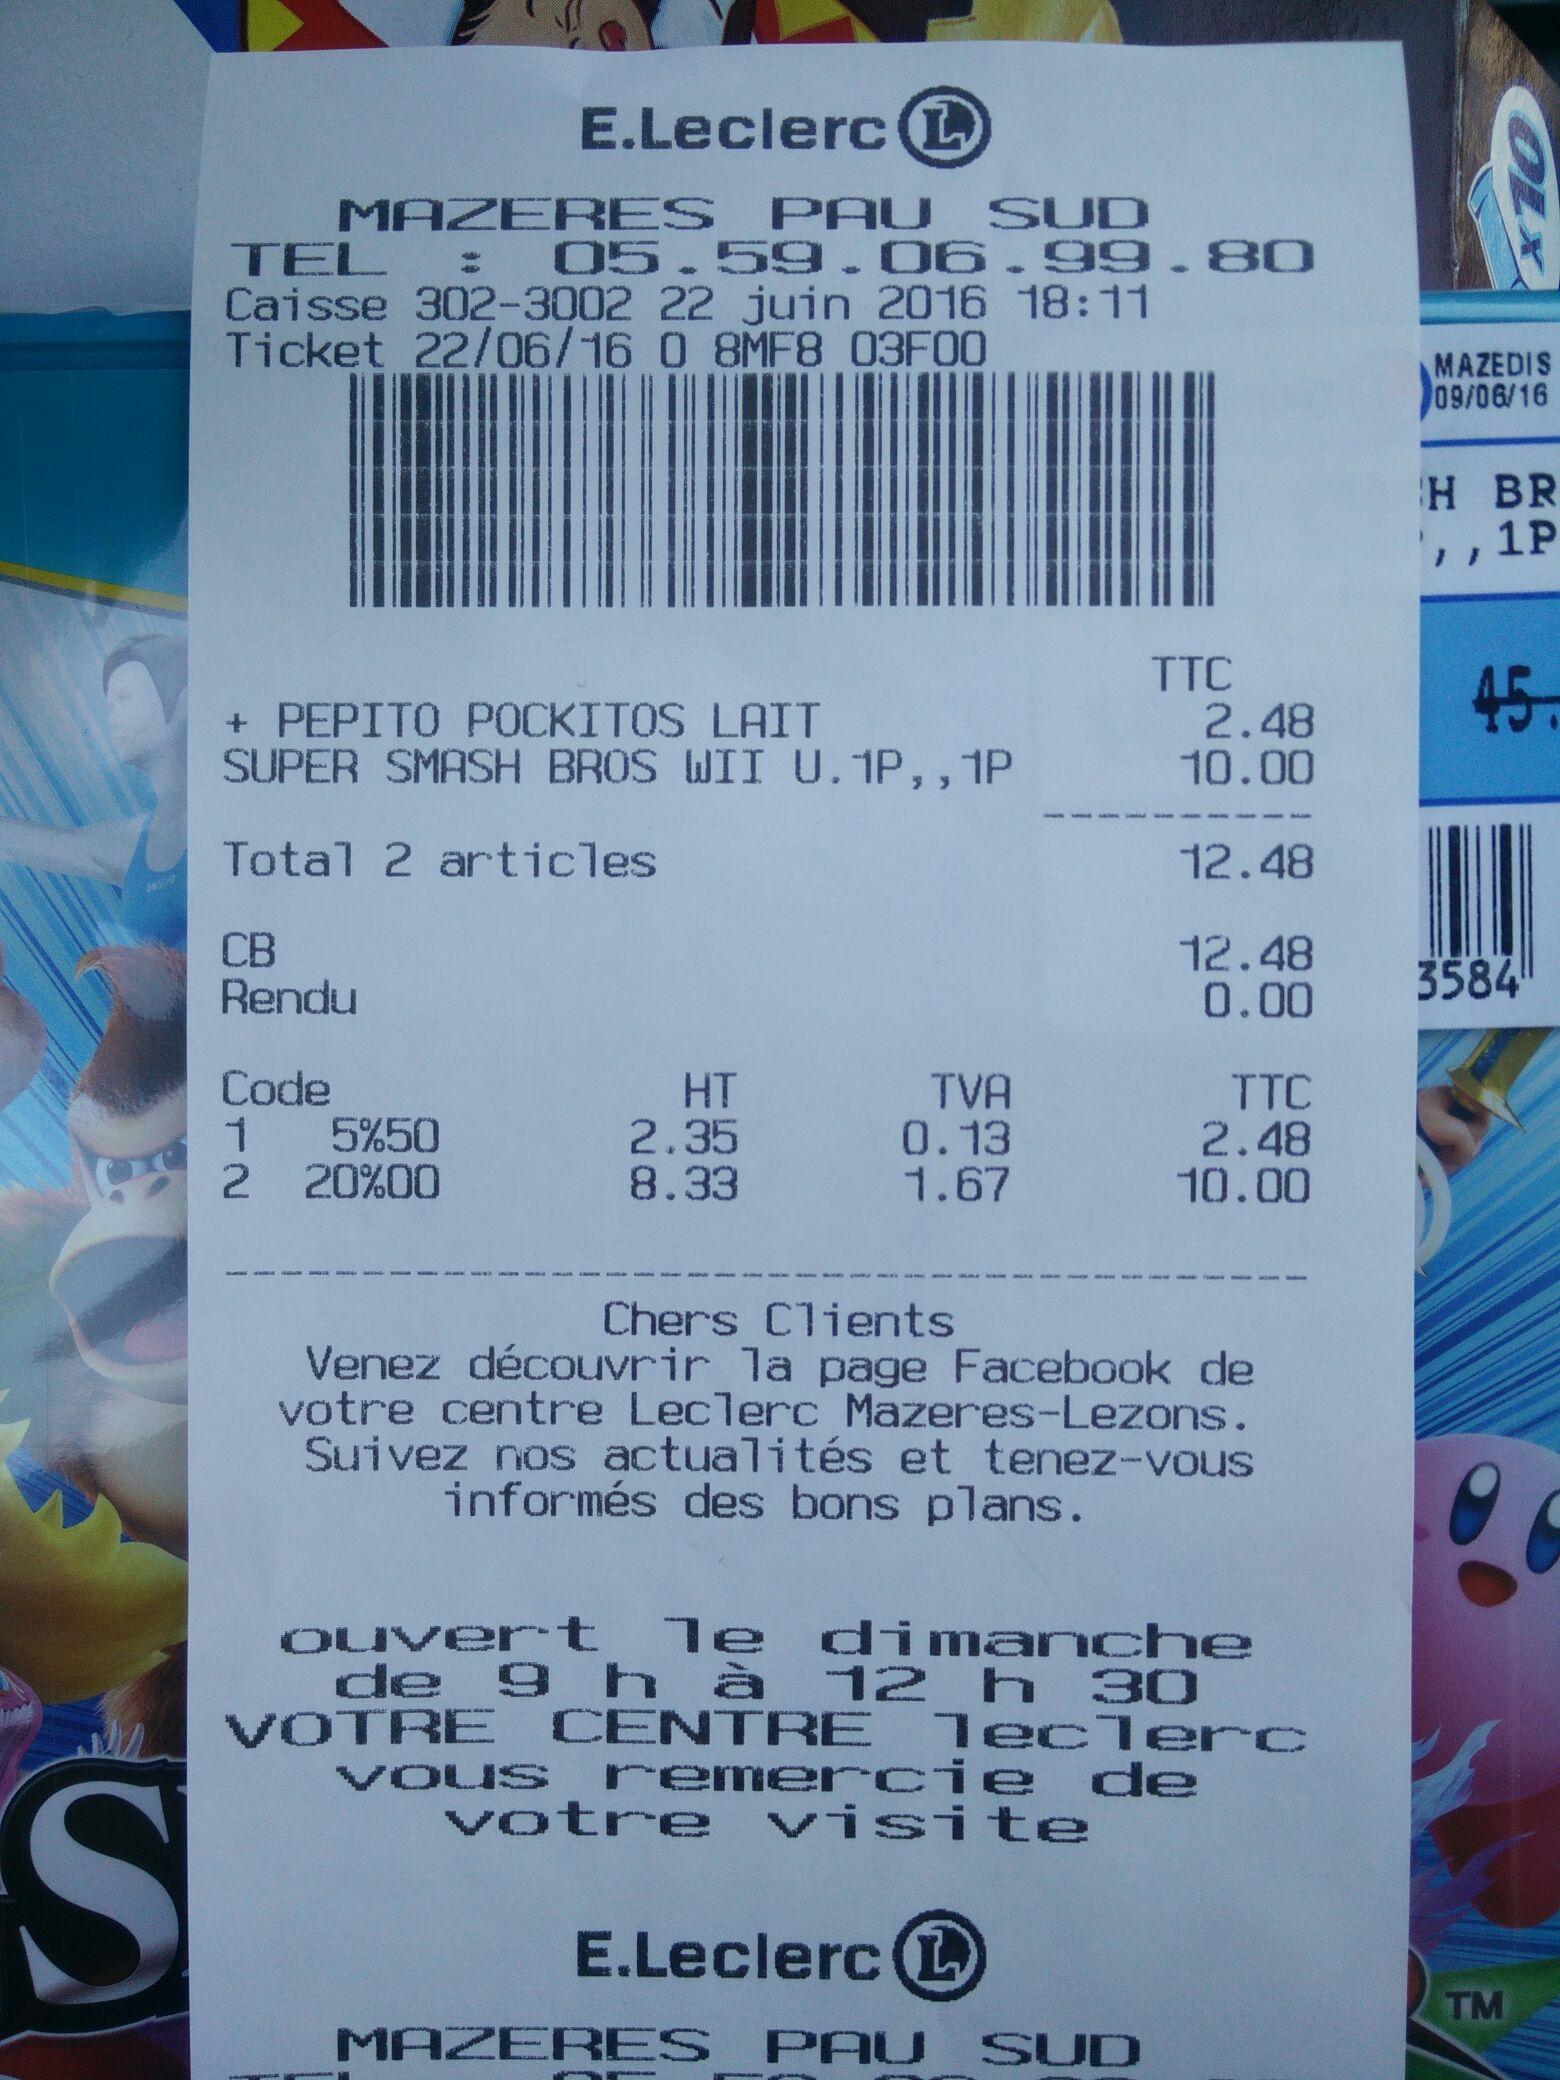 Super Smash Bros sur Wii U